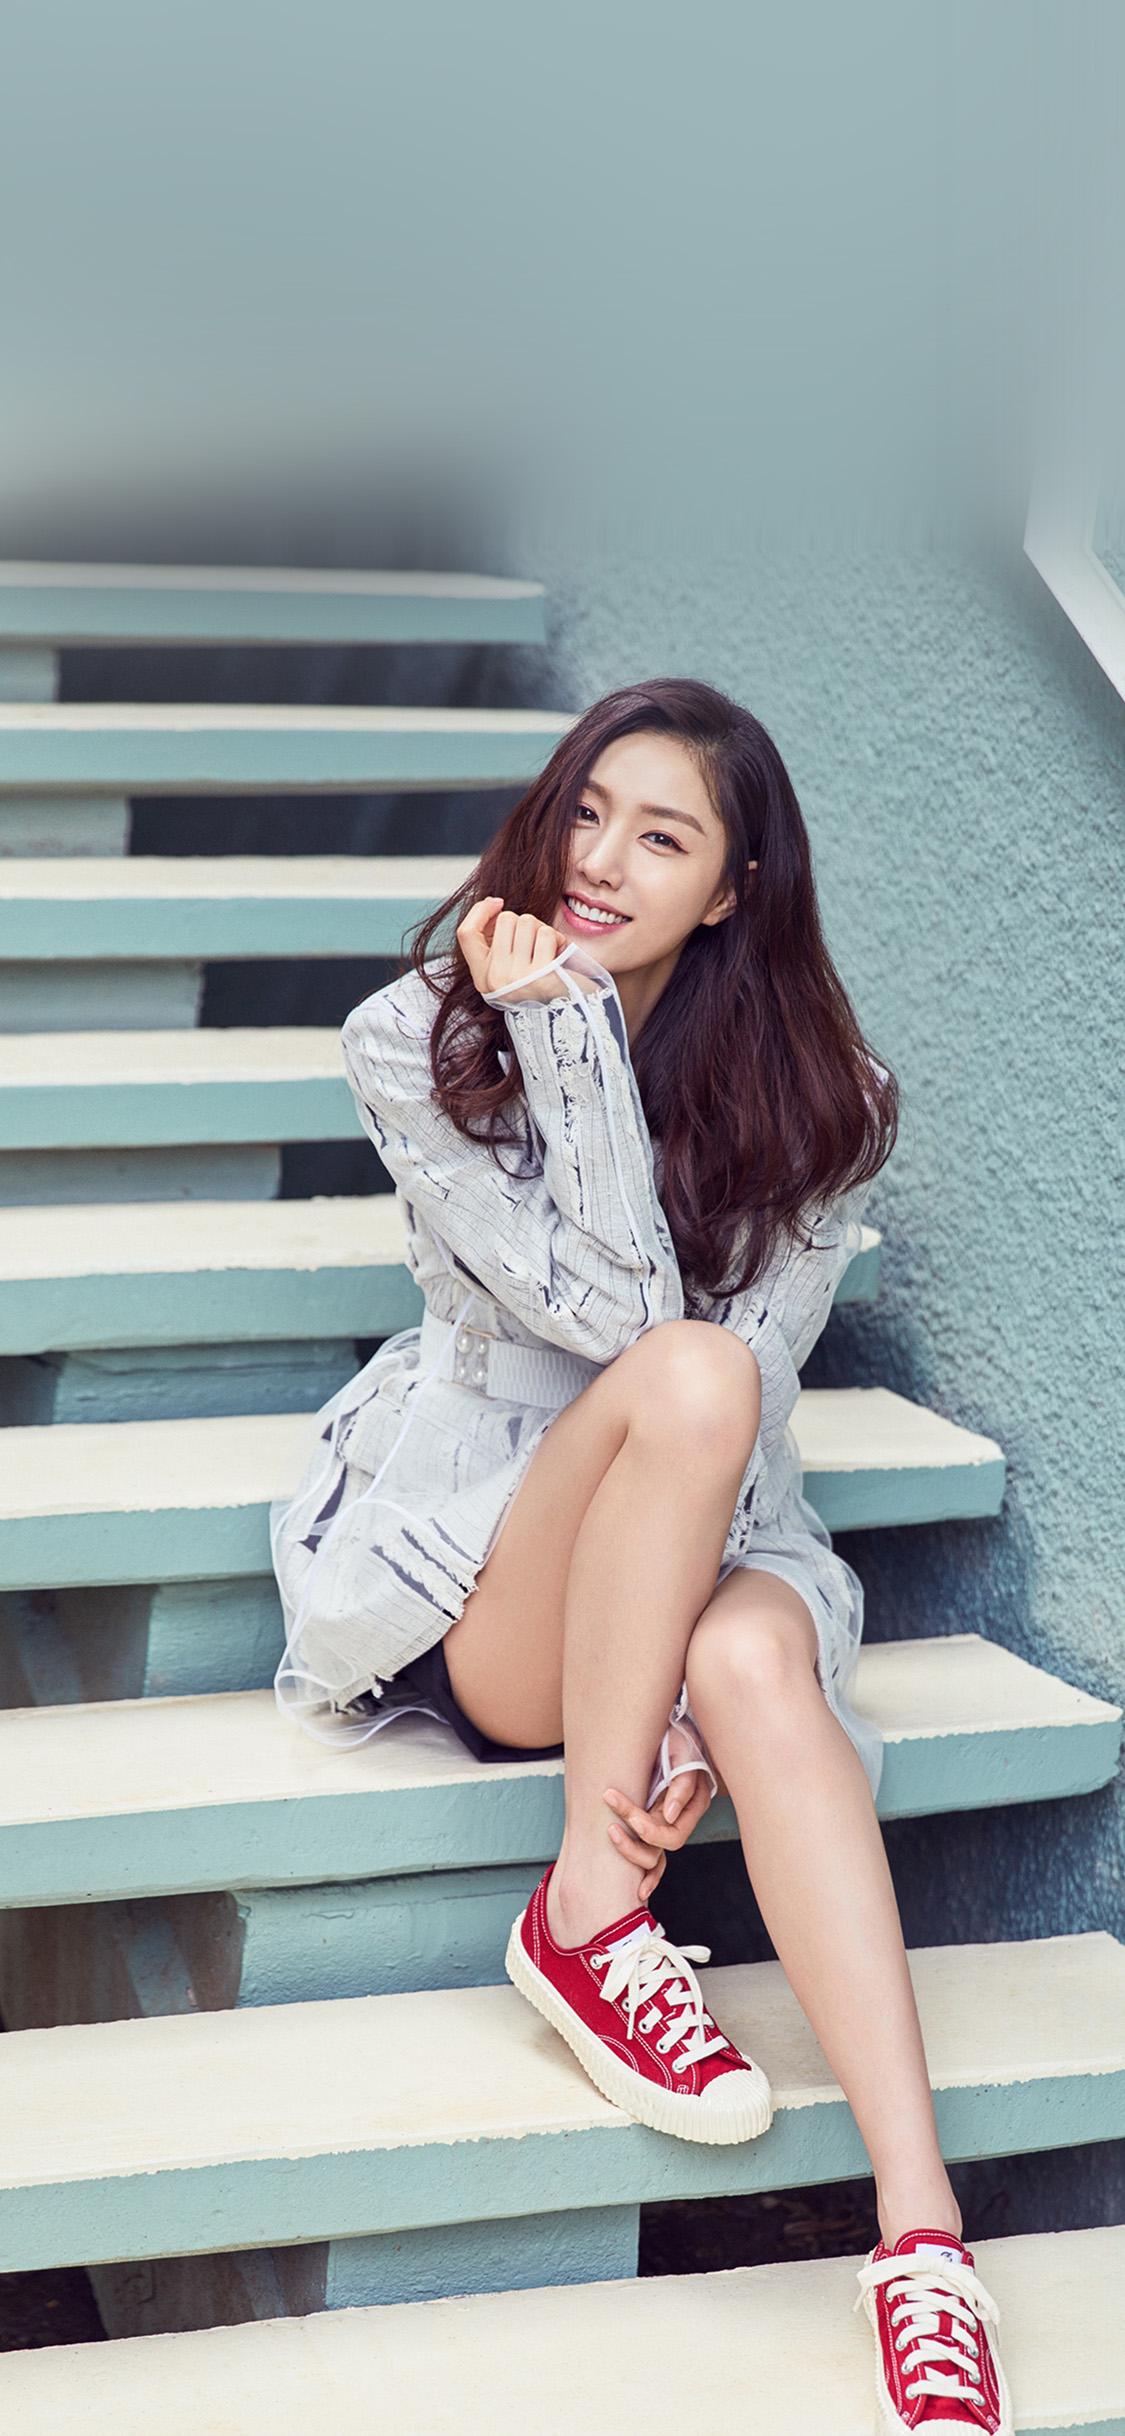 iPhonexpapers.com-Apple-iPhone-wallpaper-hq75-kpop-girl-stair-korean